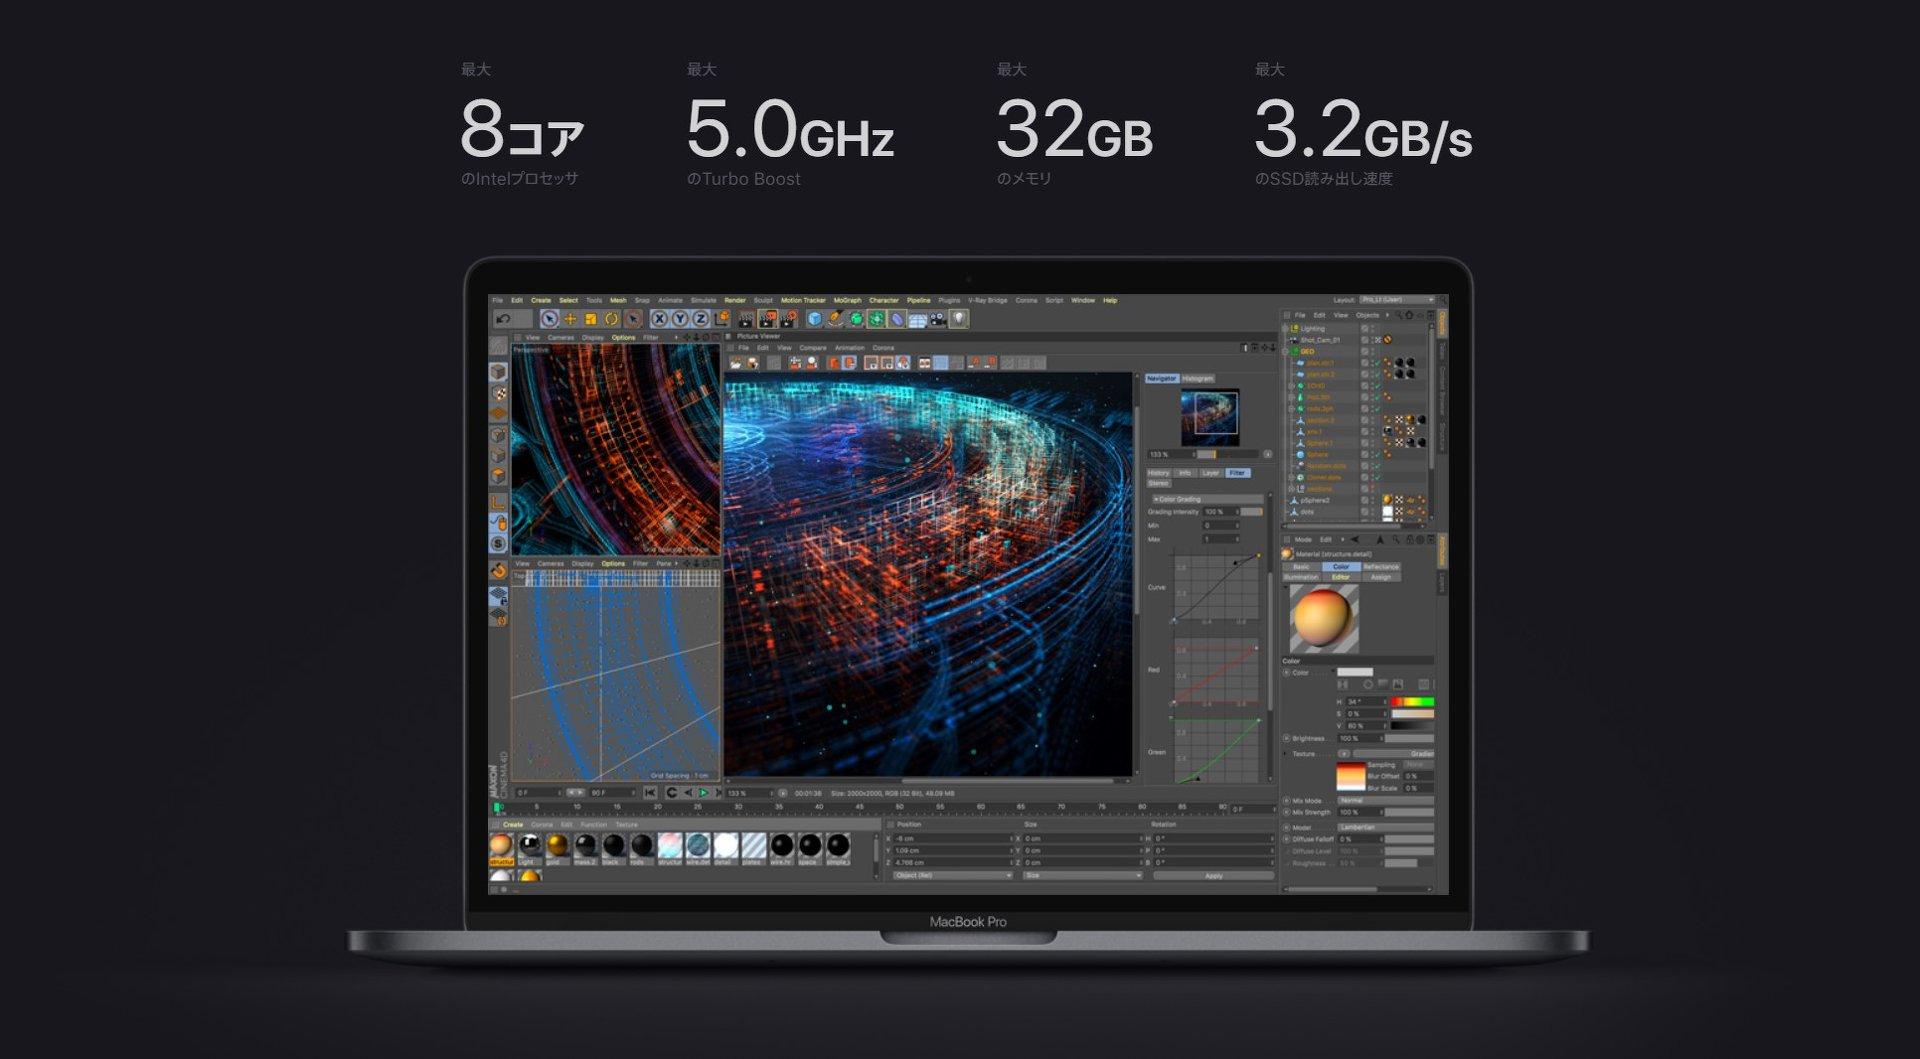 新型「MacBook Pro」発表 最大8コア5GHzで動作